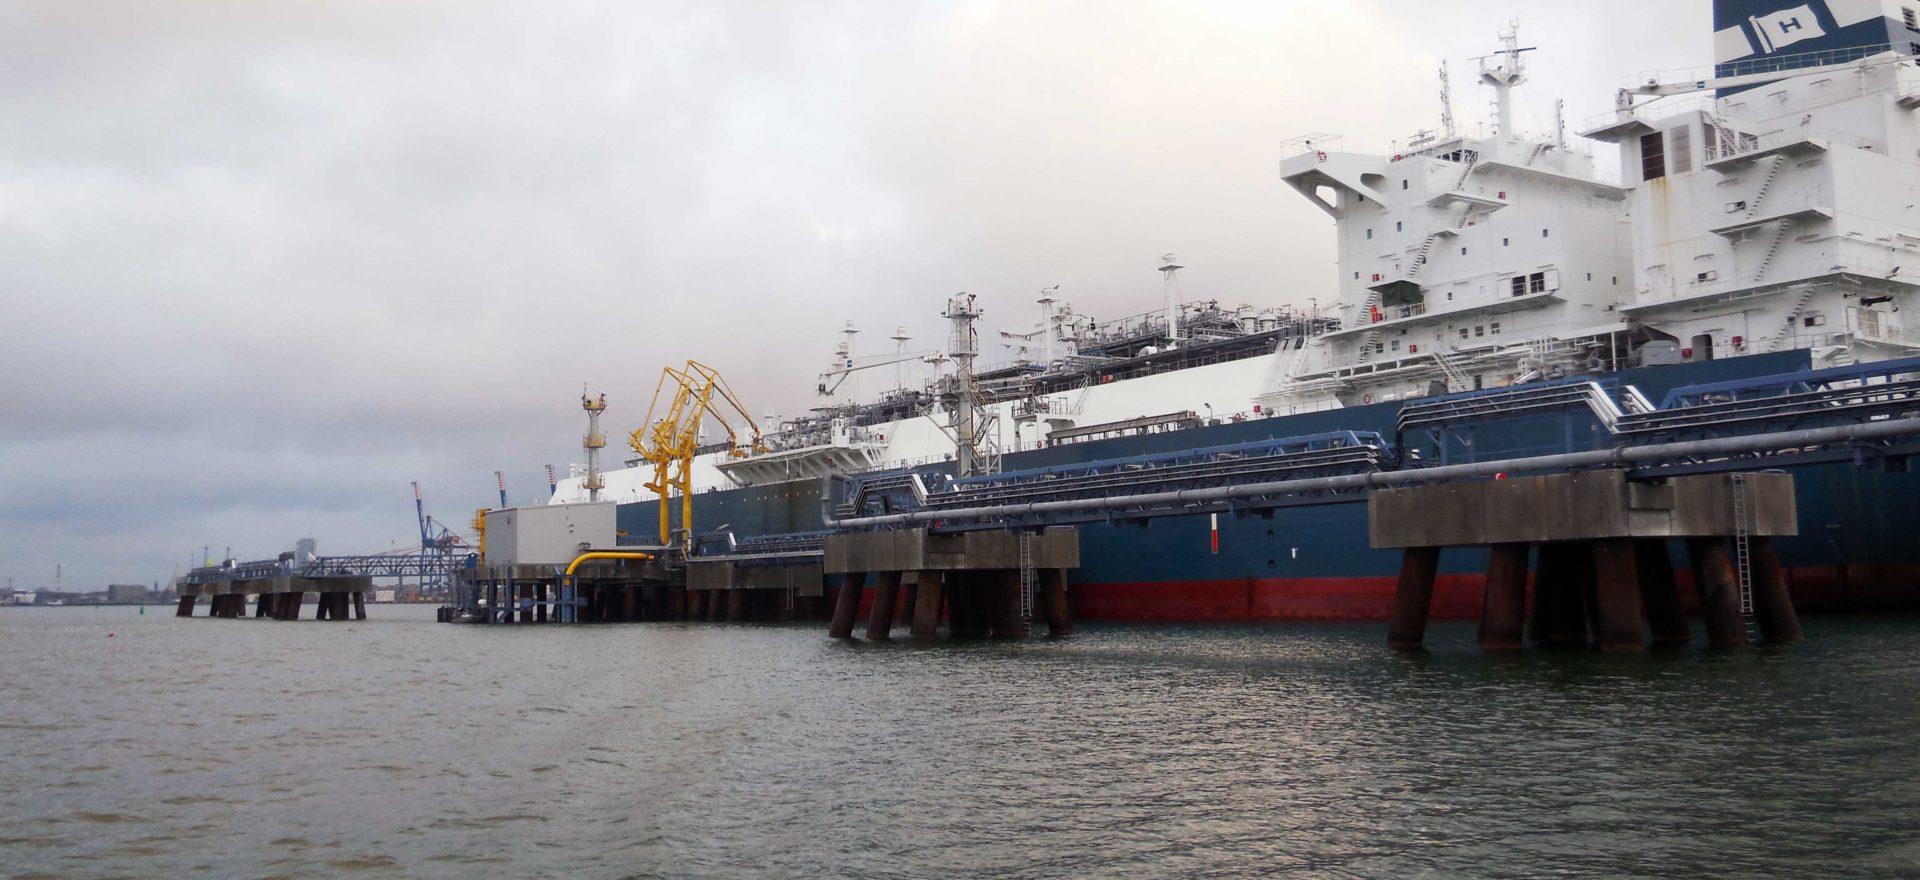 klaipedos–LNG-Small-scale-sofregaz